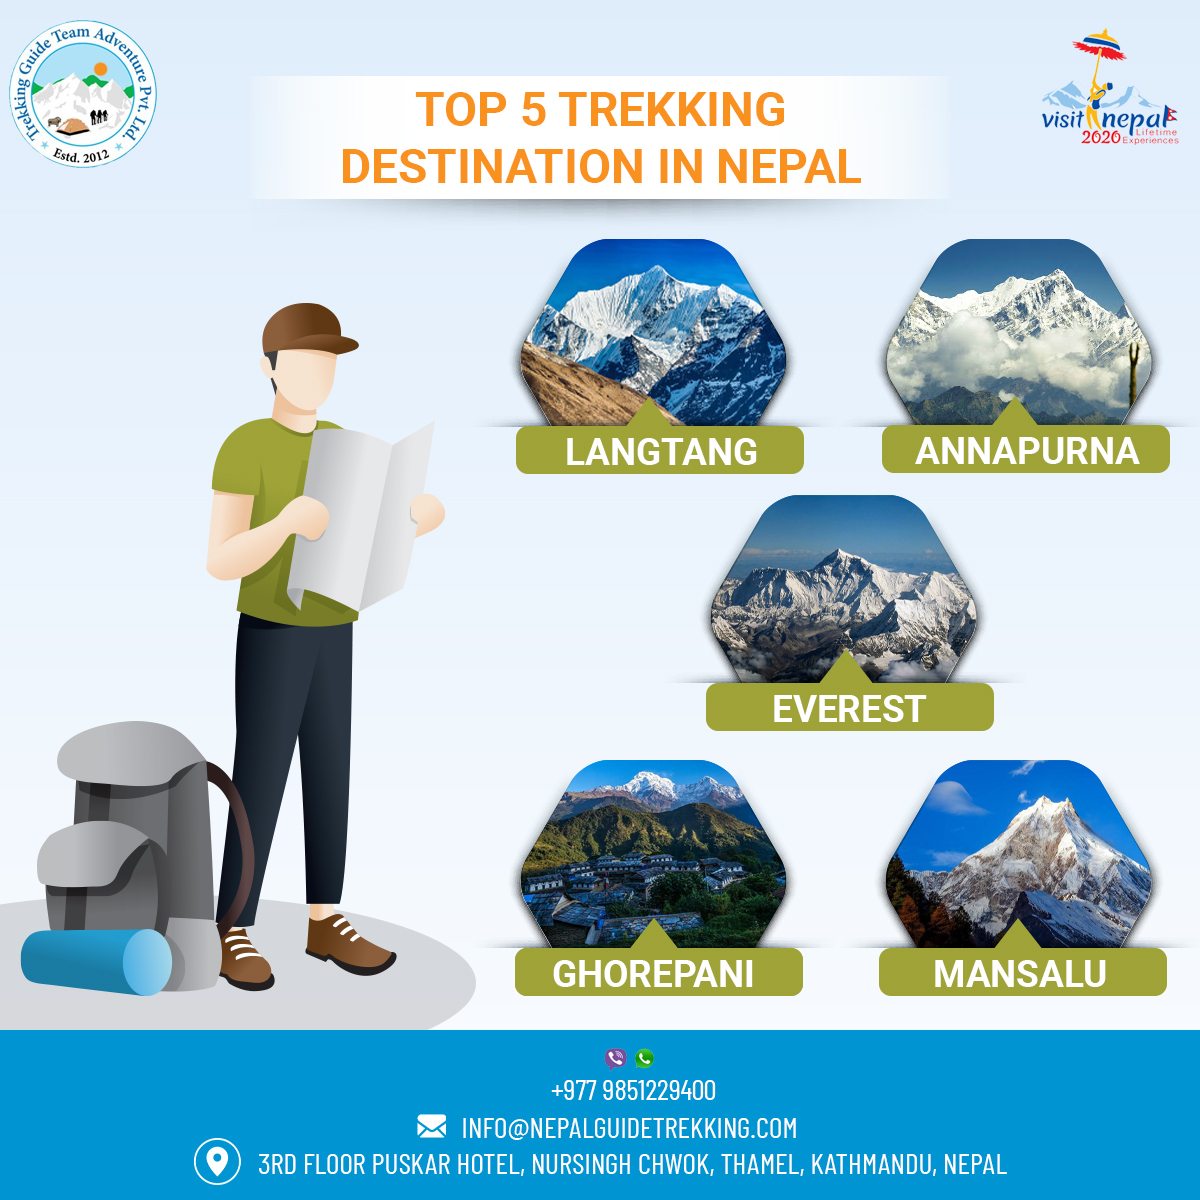 Fill your soul with the adventure in a country that homes the World's highest mountain 🗻, Mount Everest.  #trekkinginnepal #explorenepal #langtang #annapurna #everest #ghorepani #manaslu #ebctrek #abctrek #mountains #himalayas #traveller #hike #trek #visitnepal #wanderlust